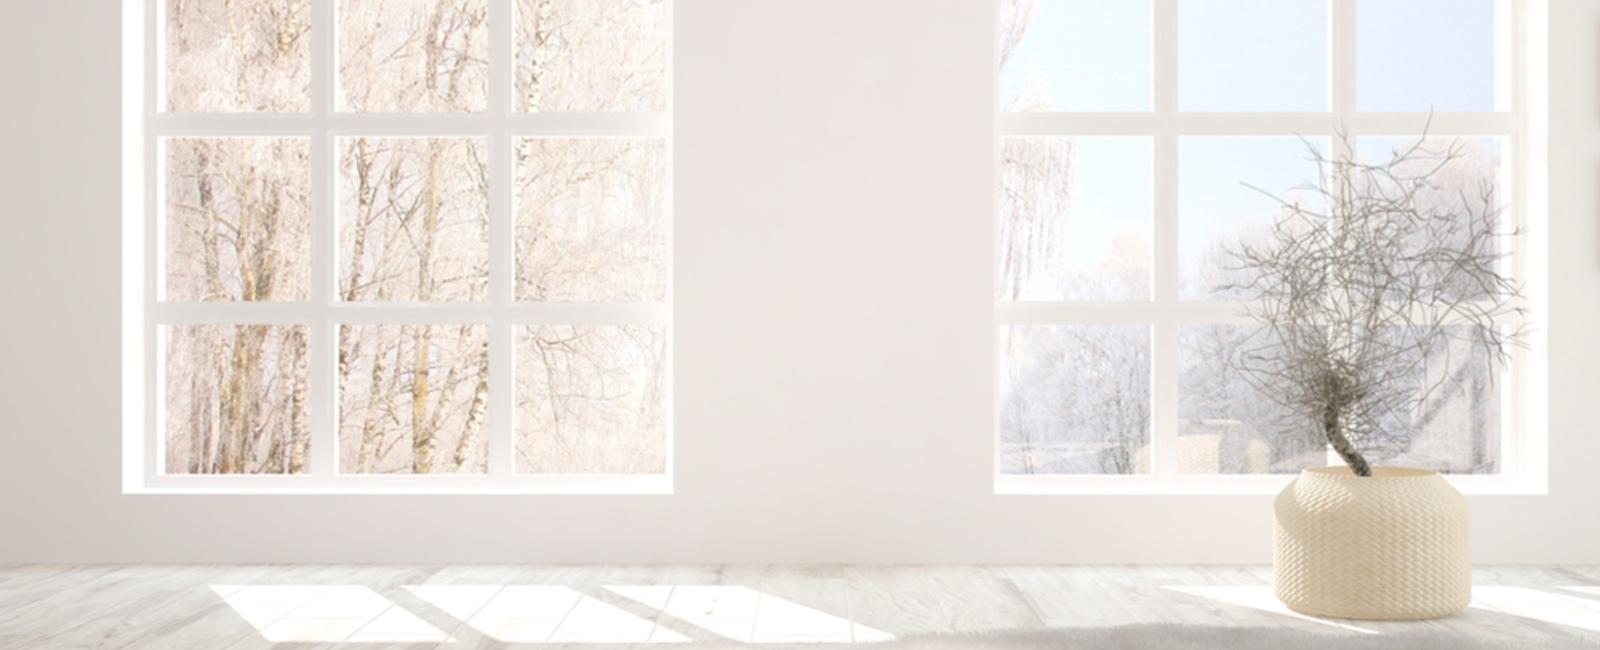 remplacer ses fenêtres en hiver